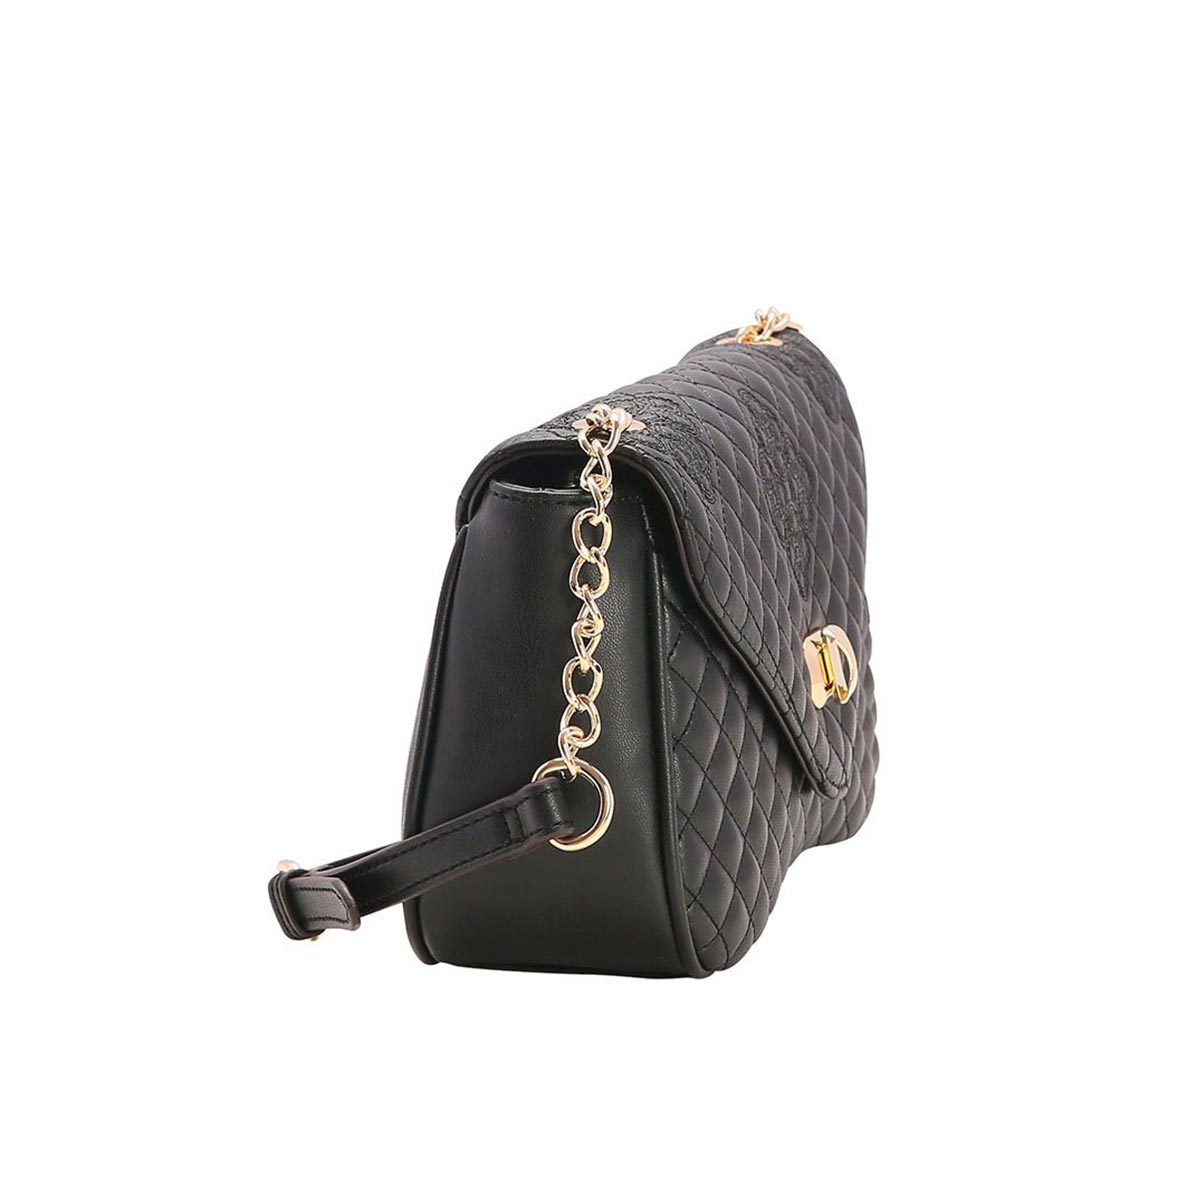 Bolsa Pequena Feminina Chenson Metalassê Transversal Chique